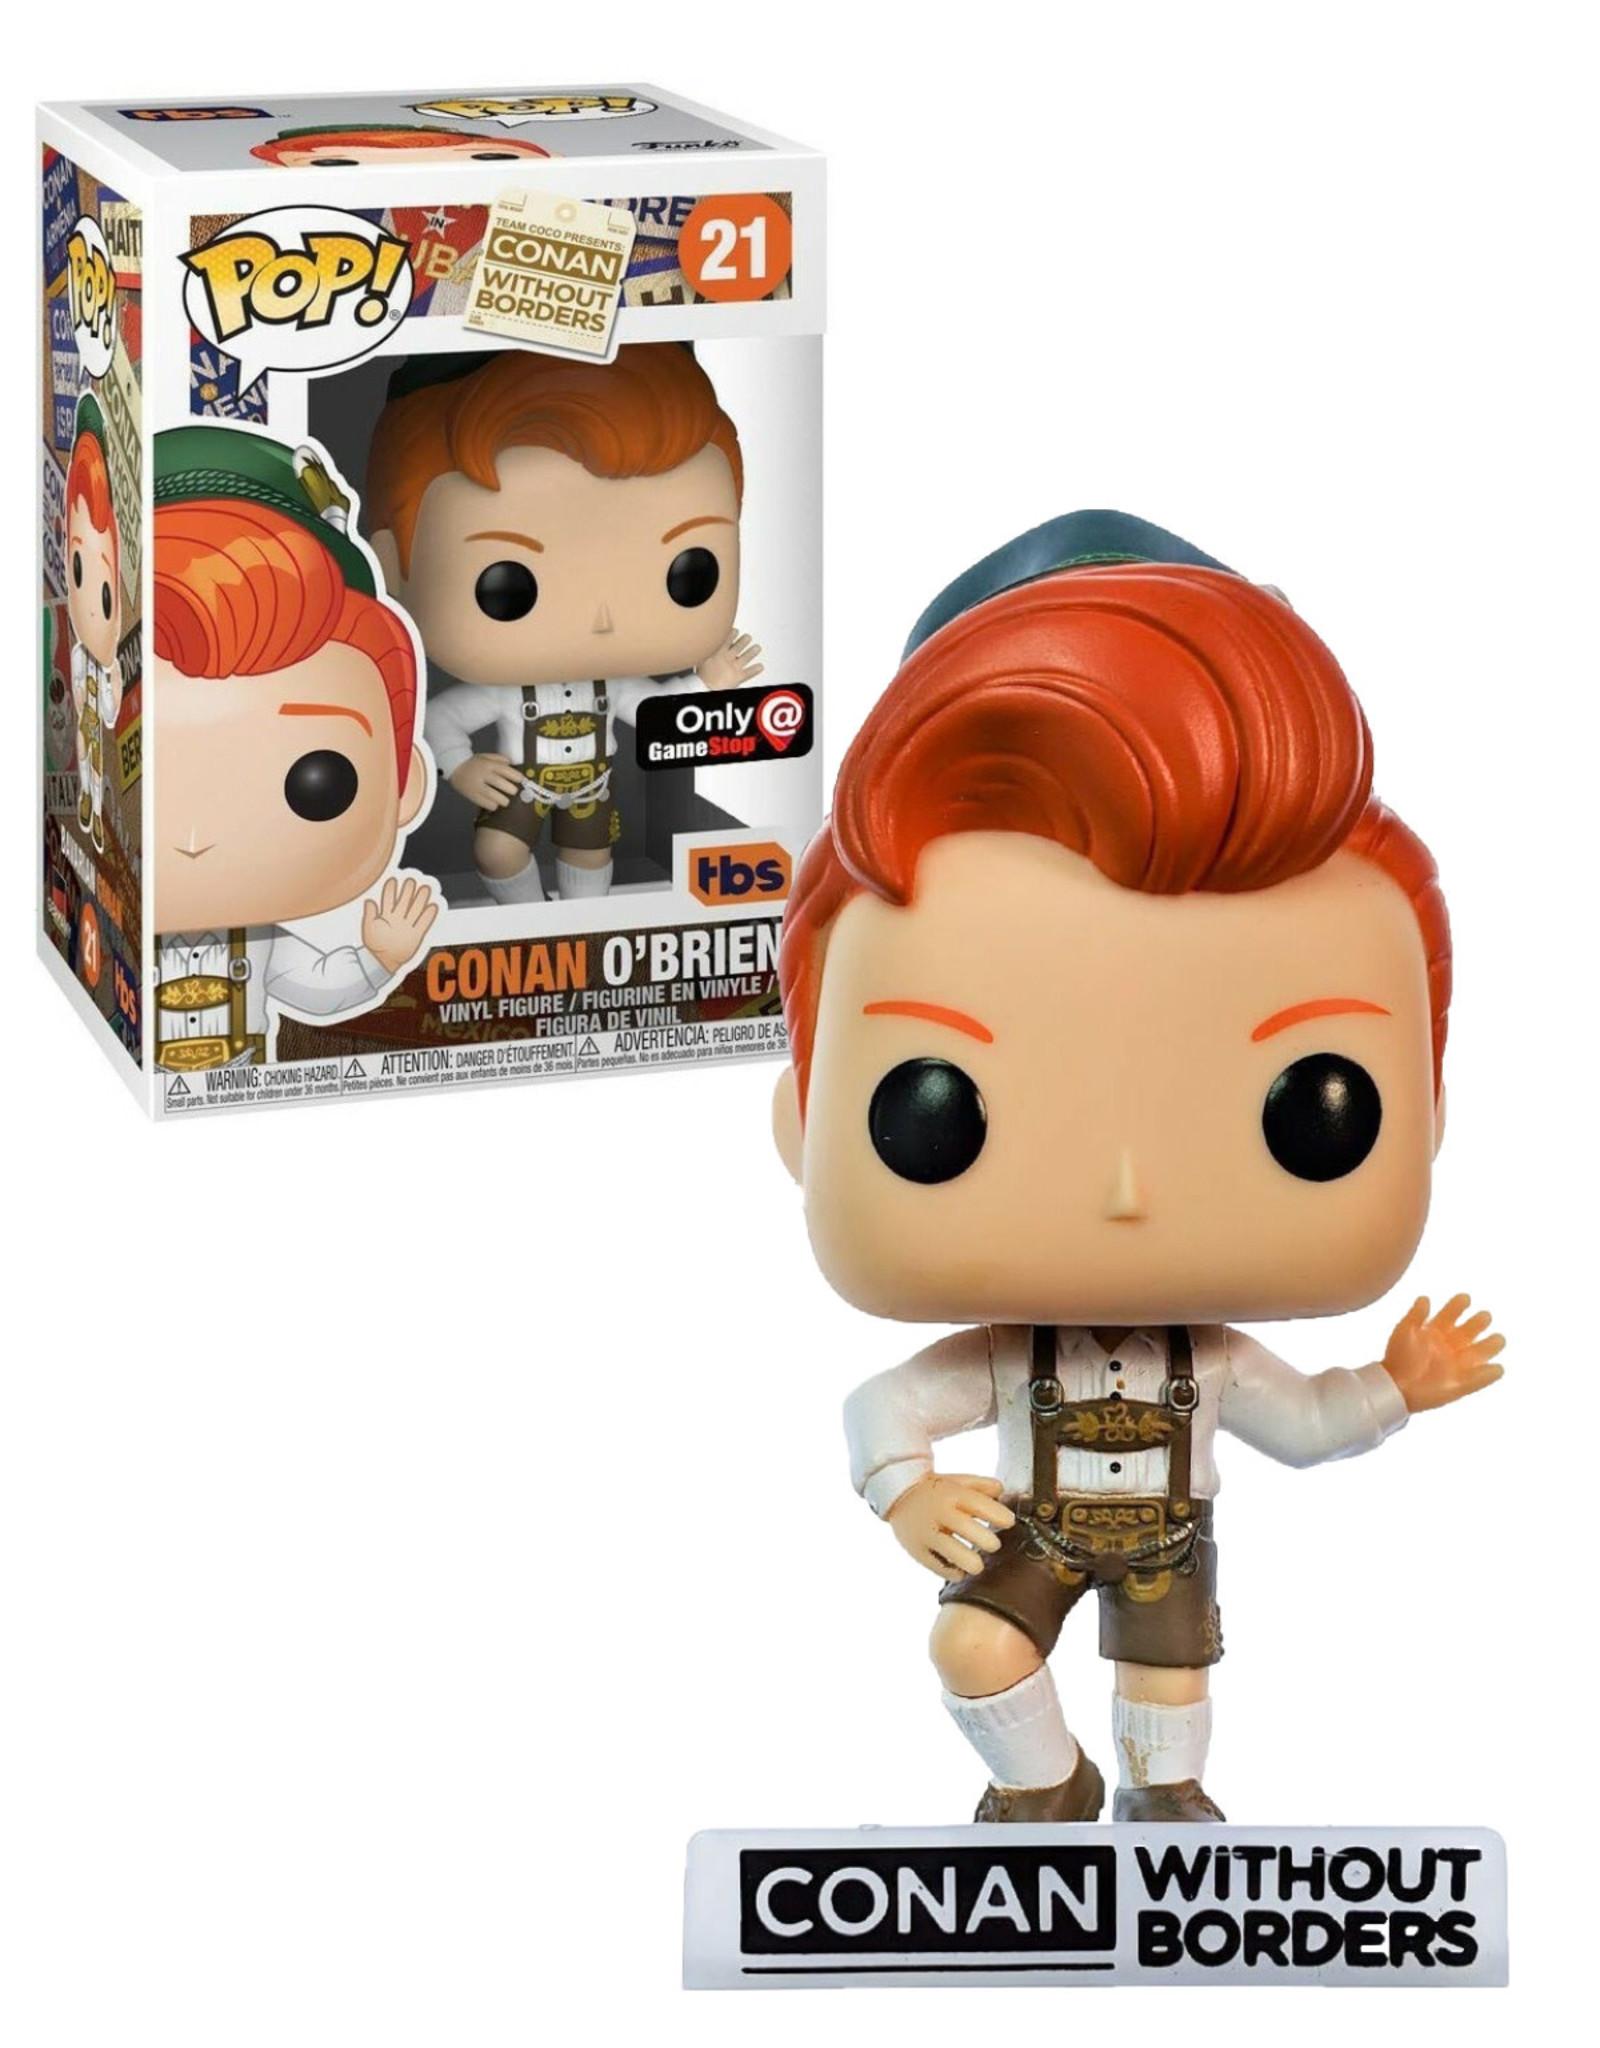 Conan Without Borders 21 ( Funko Pop ) Conan O'Brien